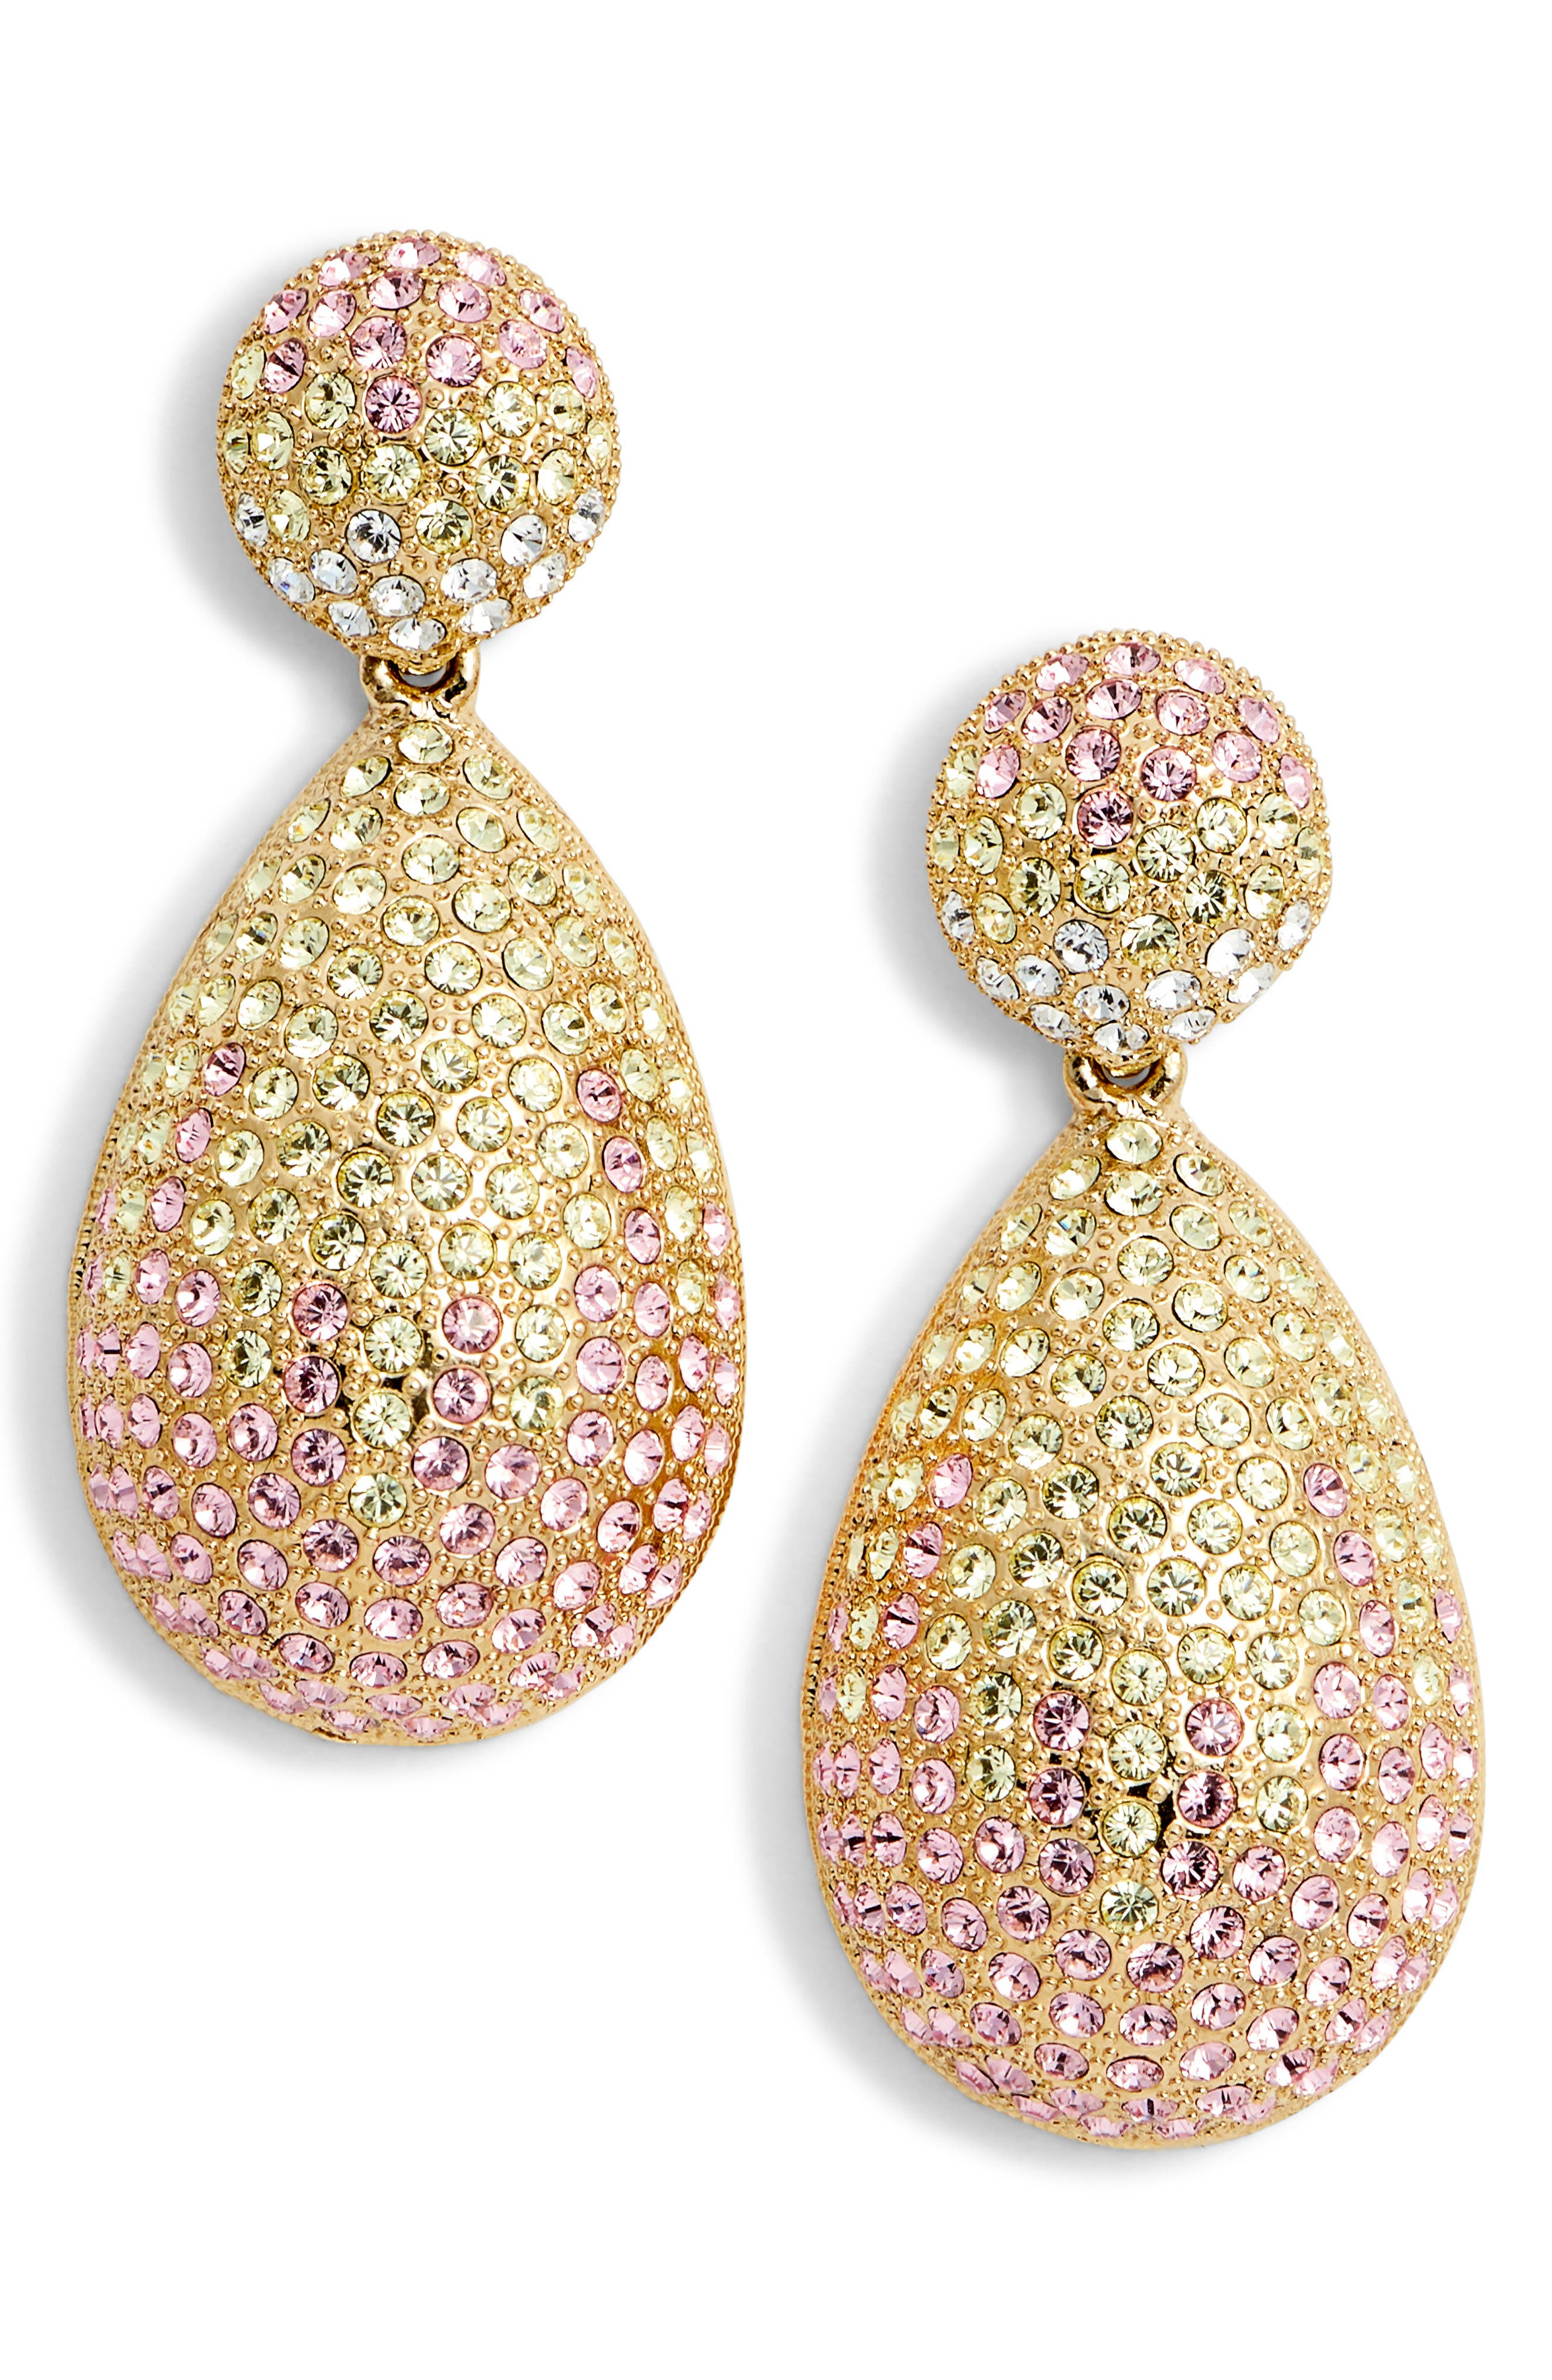 Large Pavé Teardrop Drop Earrings,                             Main thumbnail 1, color,                             Ombre Rose Multi/ Gold